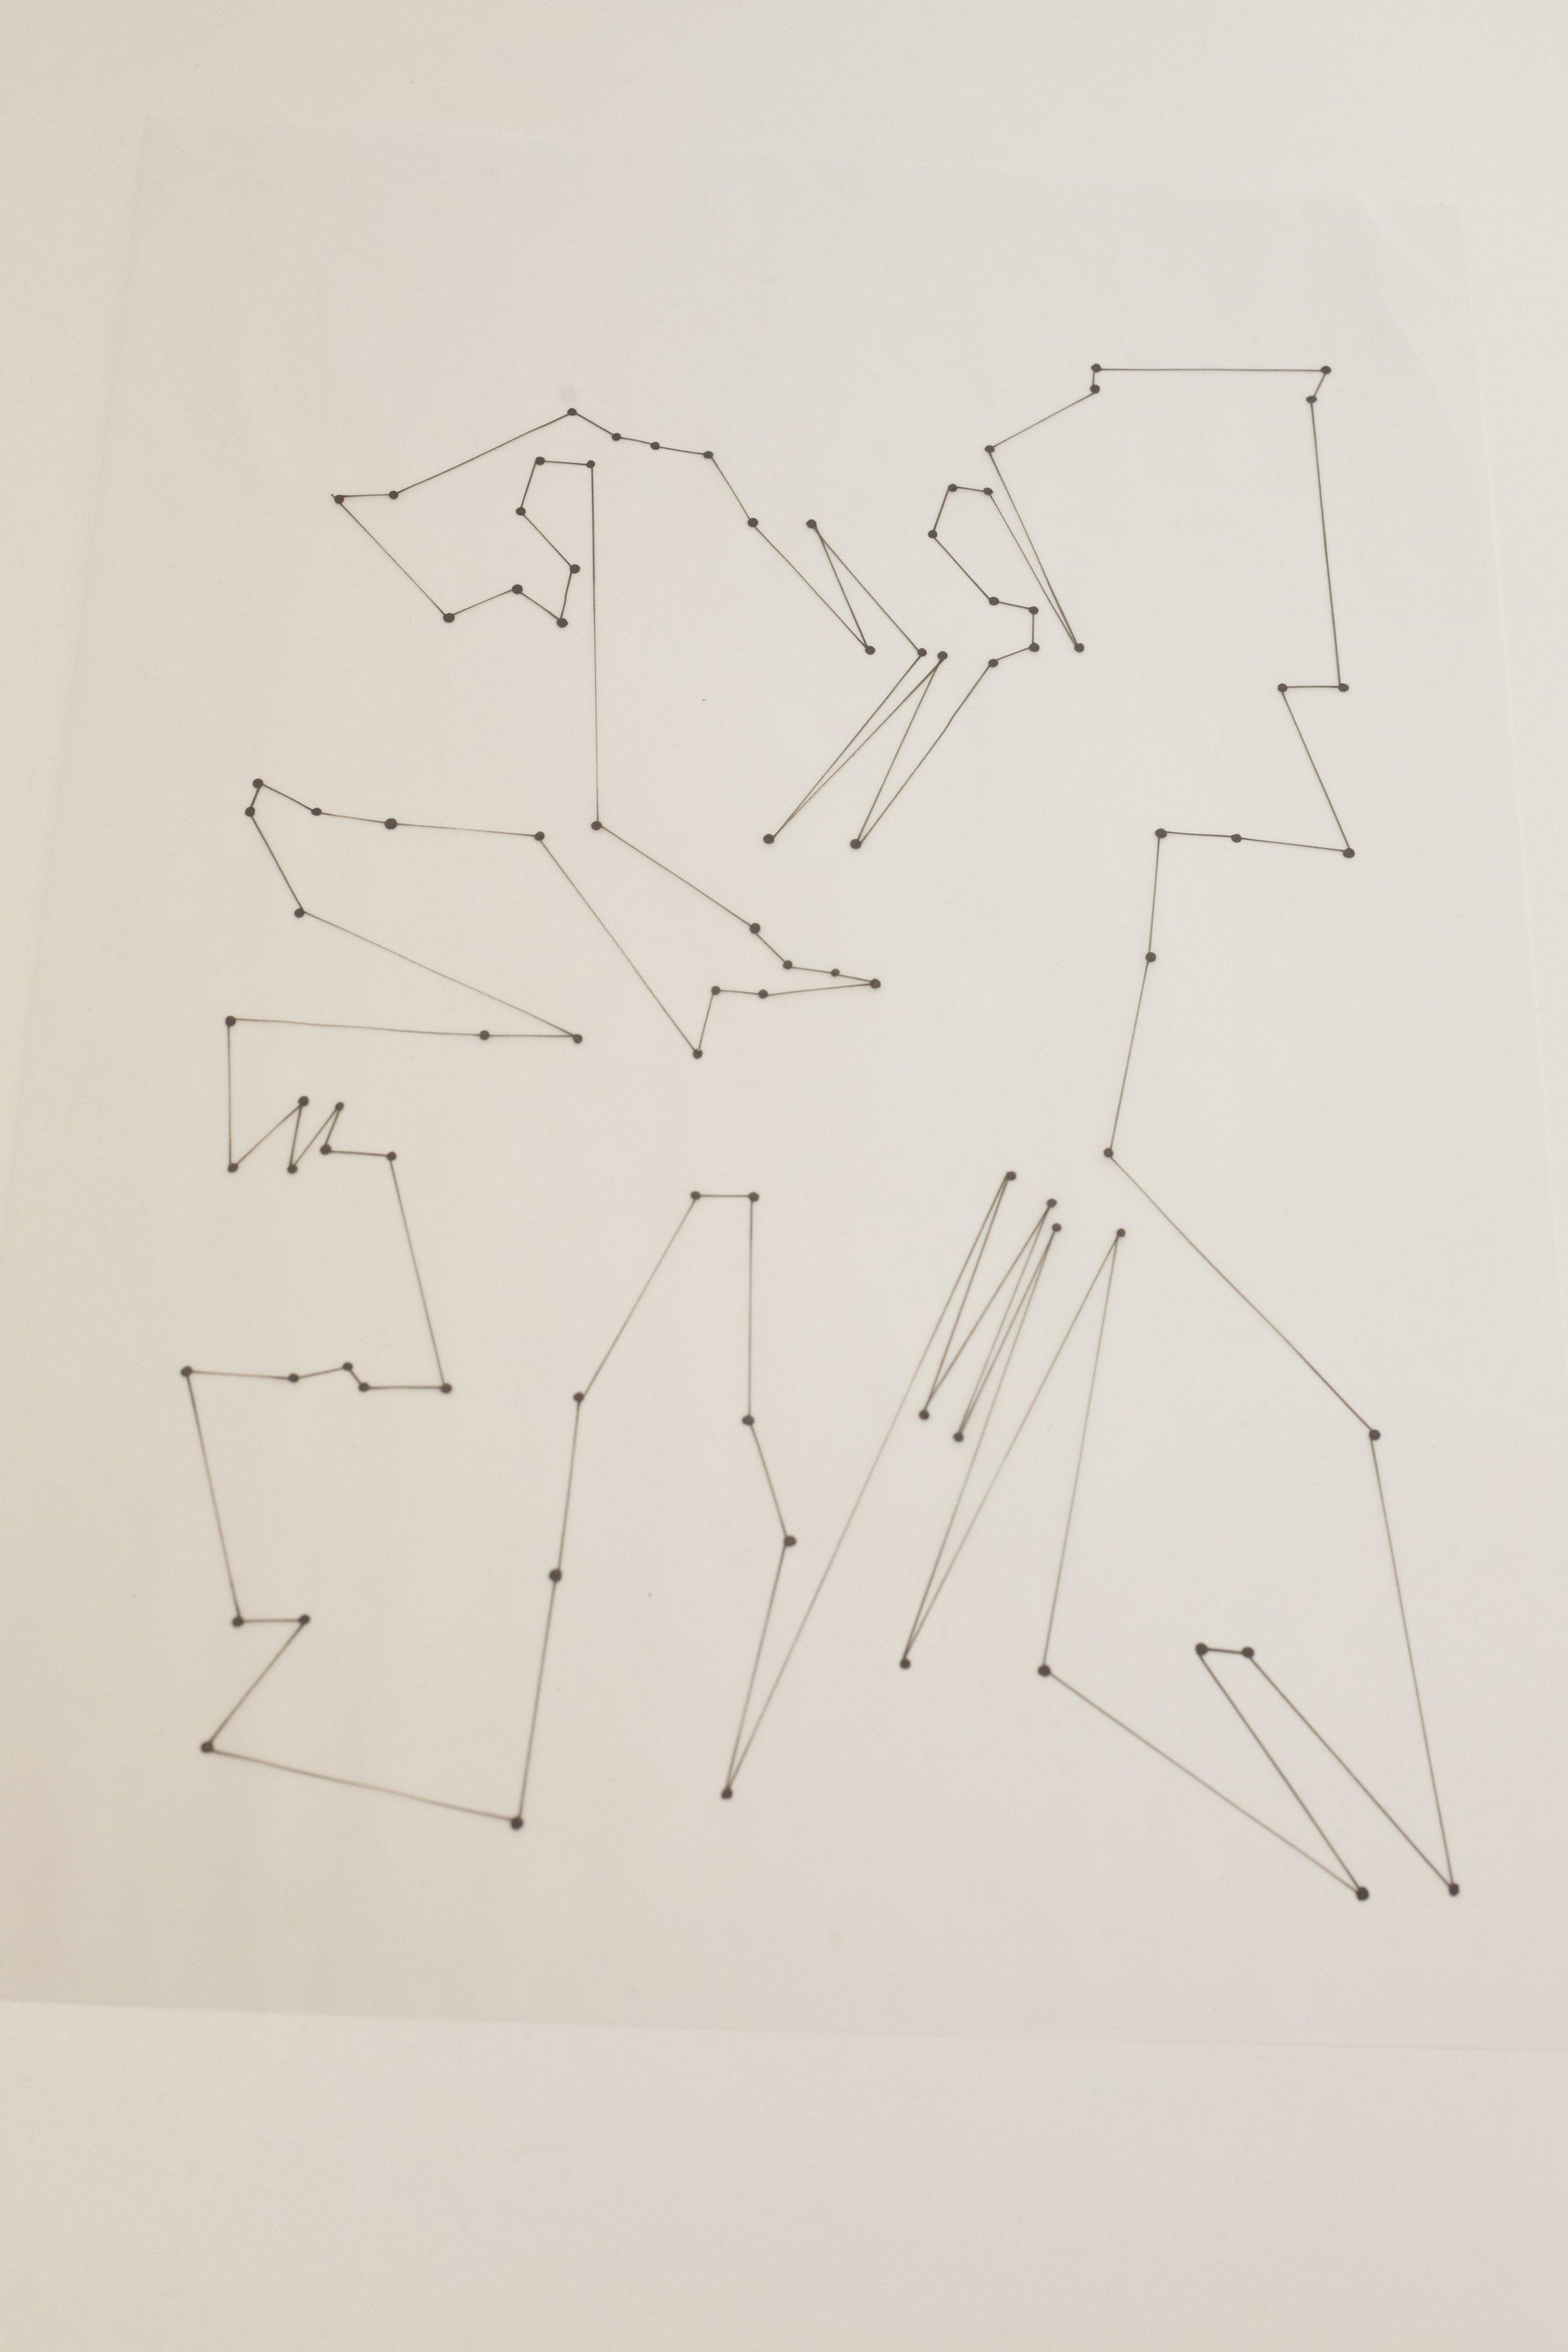 Callejuca   2018, DINA3, tinta negra sobre papel vegetal  Foto: Esther Camacho